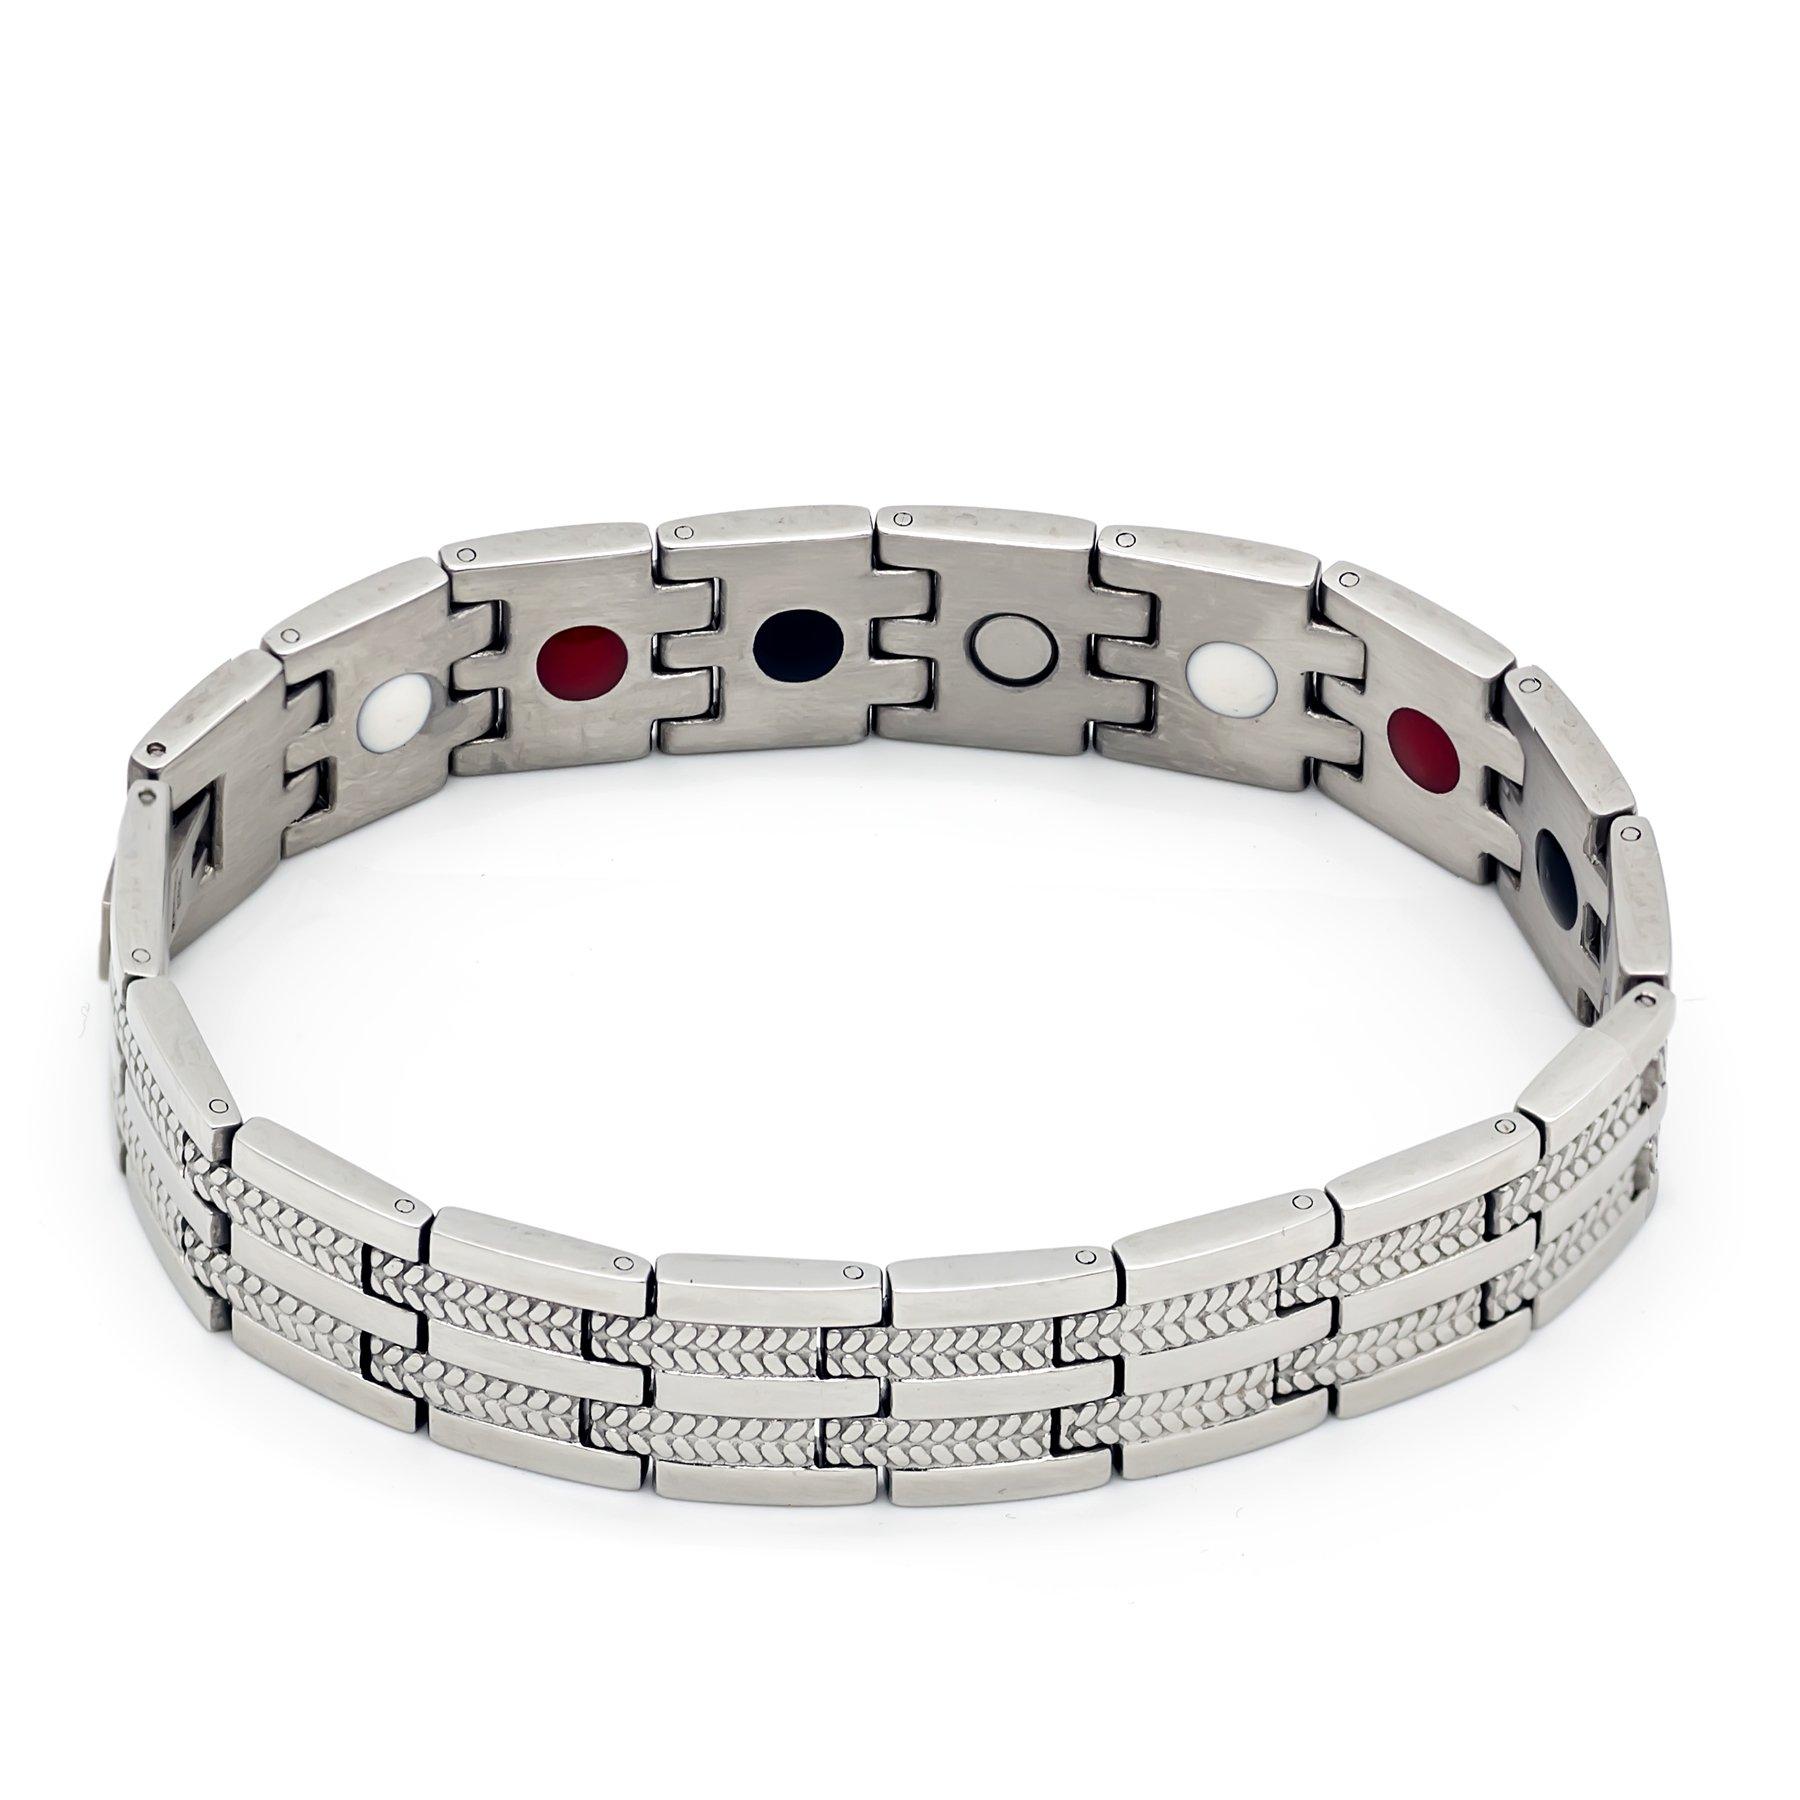 Colorful Bling Healthy Care Magnetic Stainless Steel Bio Germanium Leaves Bracelets Bangles for Men - Sliver